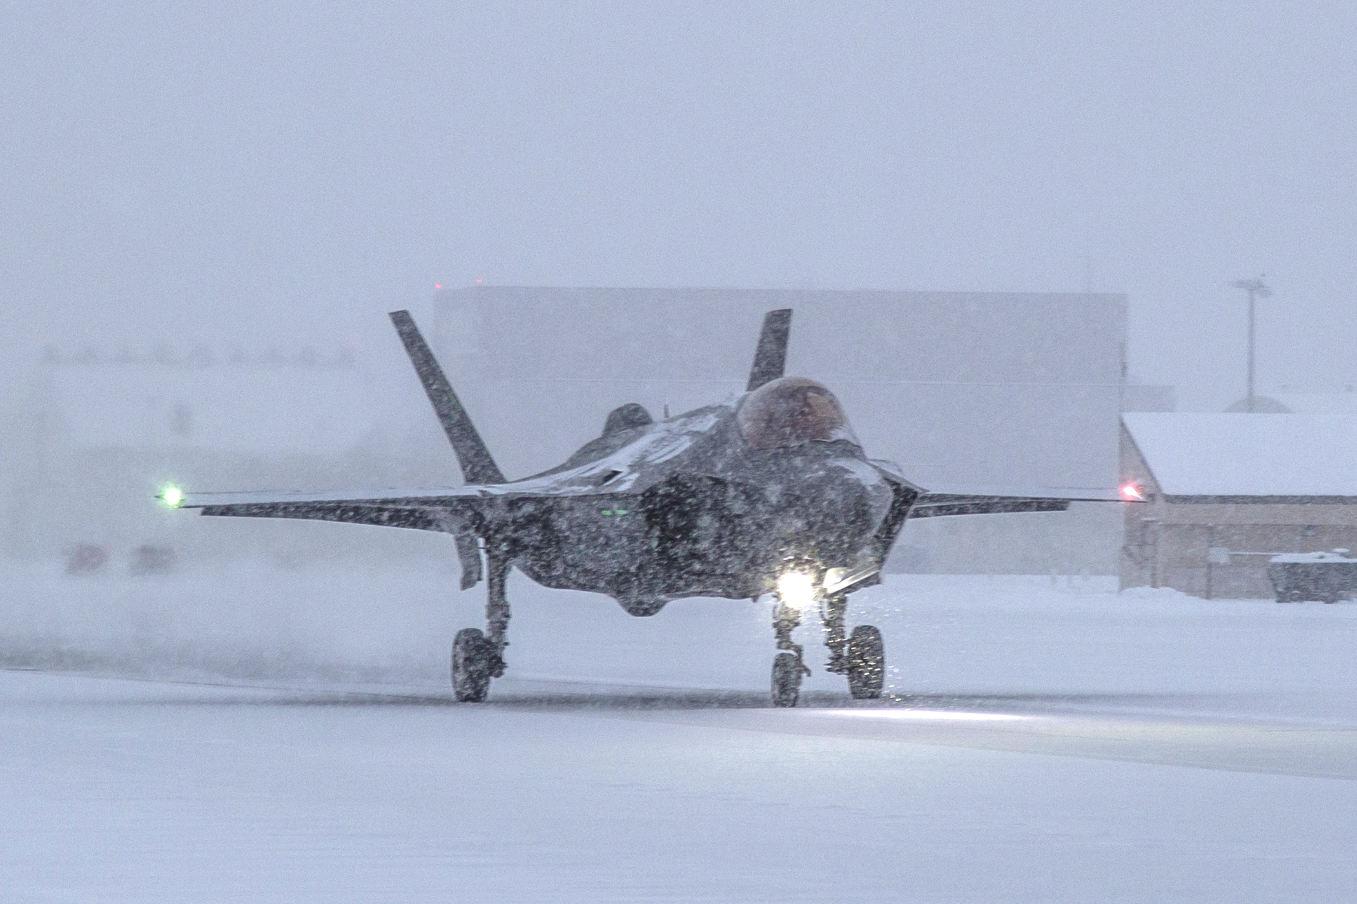 Essais du parachute-frein du F-35A norvégien en Alaska